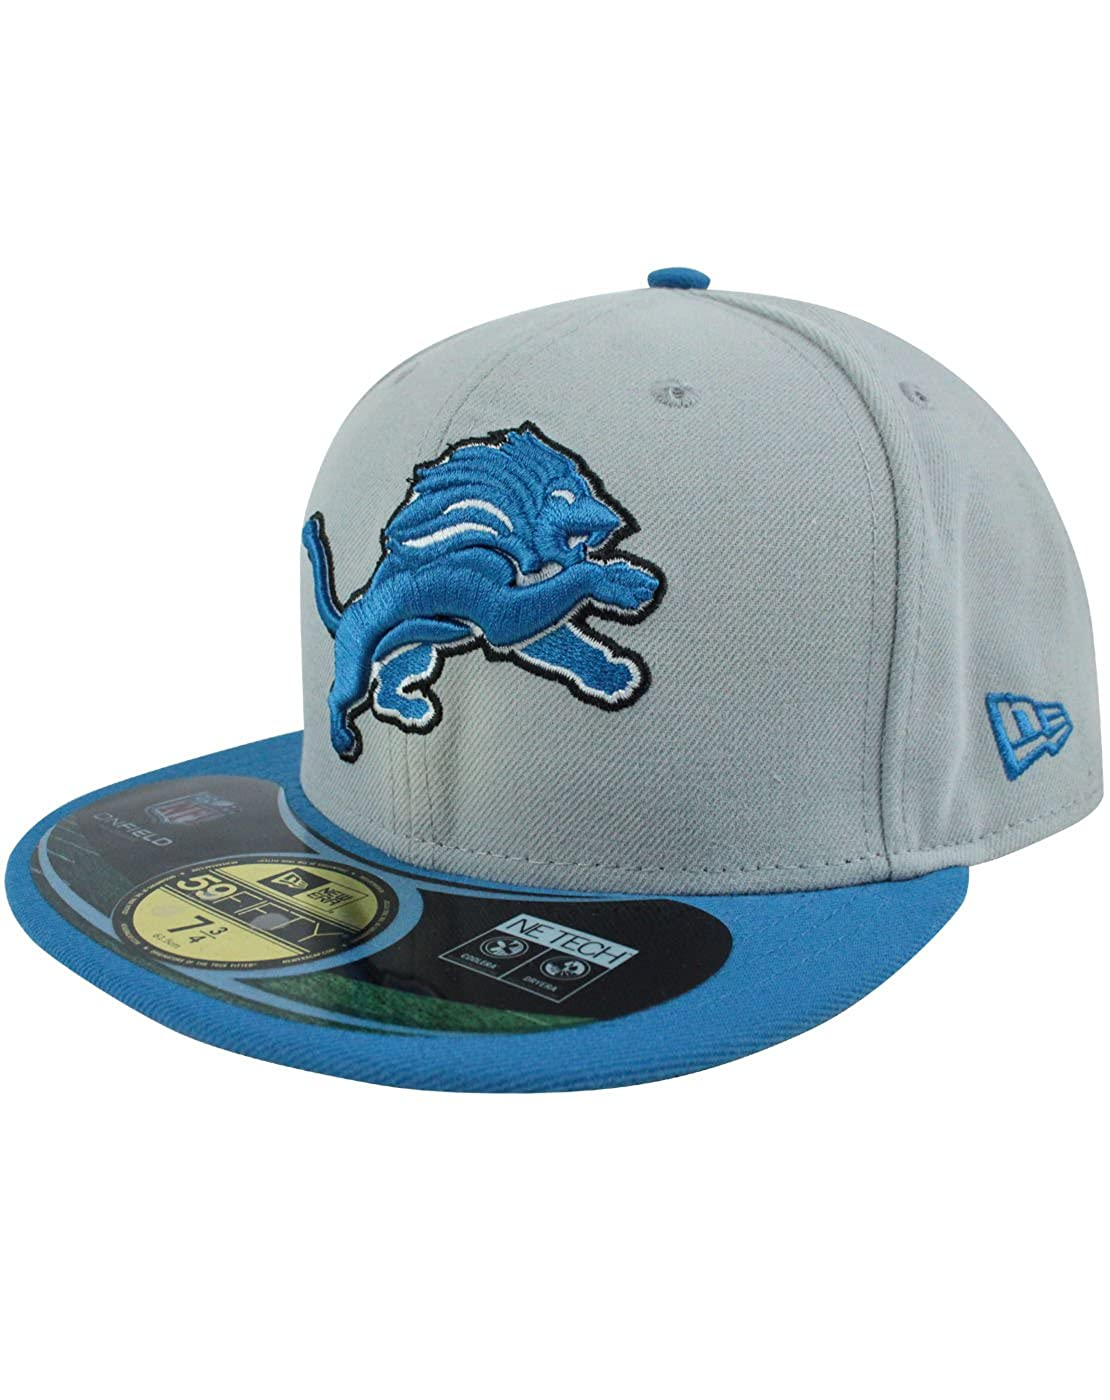 Unisex-Erwachsener Unisex-Erwachsener Unisex-Erwachsener - New Era - Detroit Lions - Mütze B016X02O5O Baseball Caps Internationale Wahl c41416